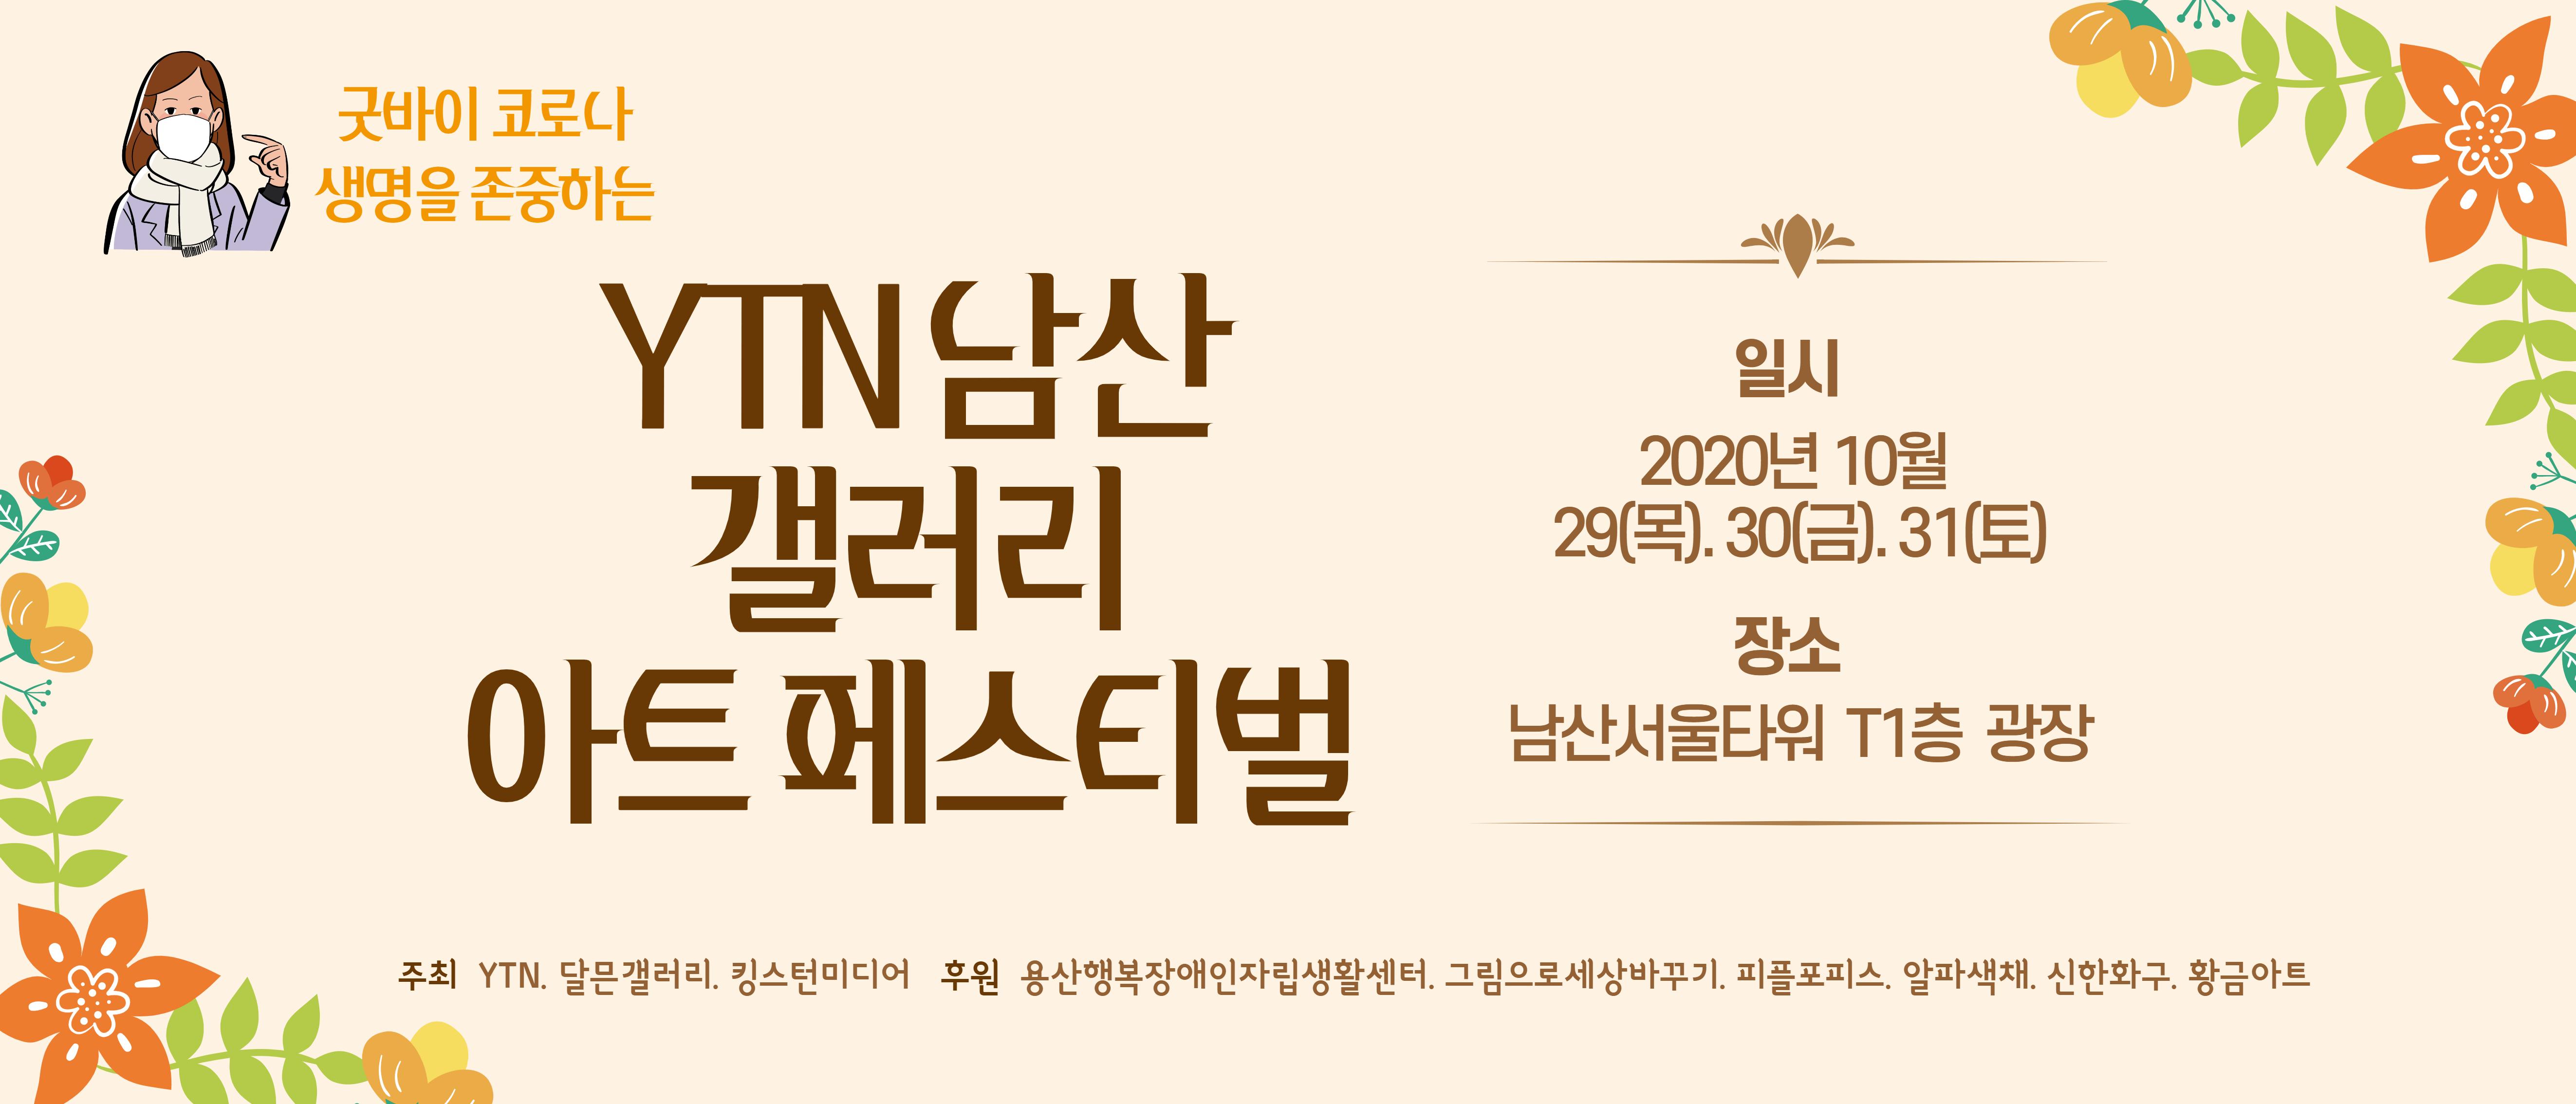 YTN 남산 갤러리 아트 페스티벌